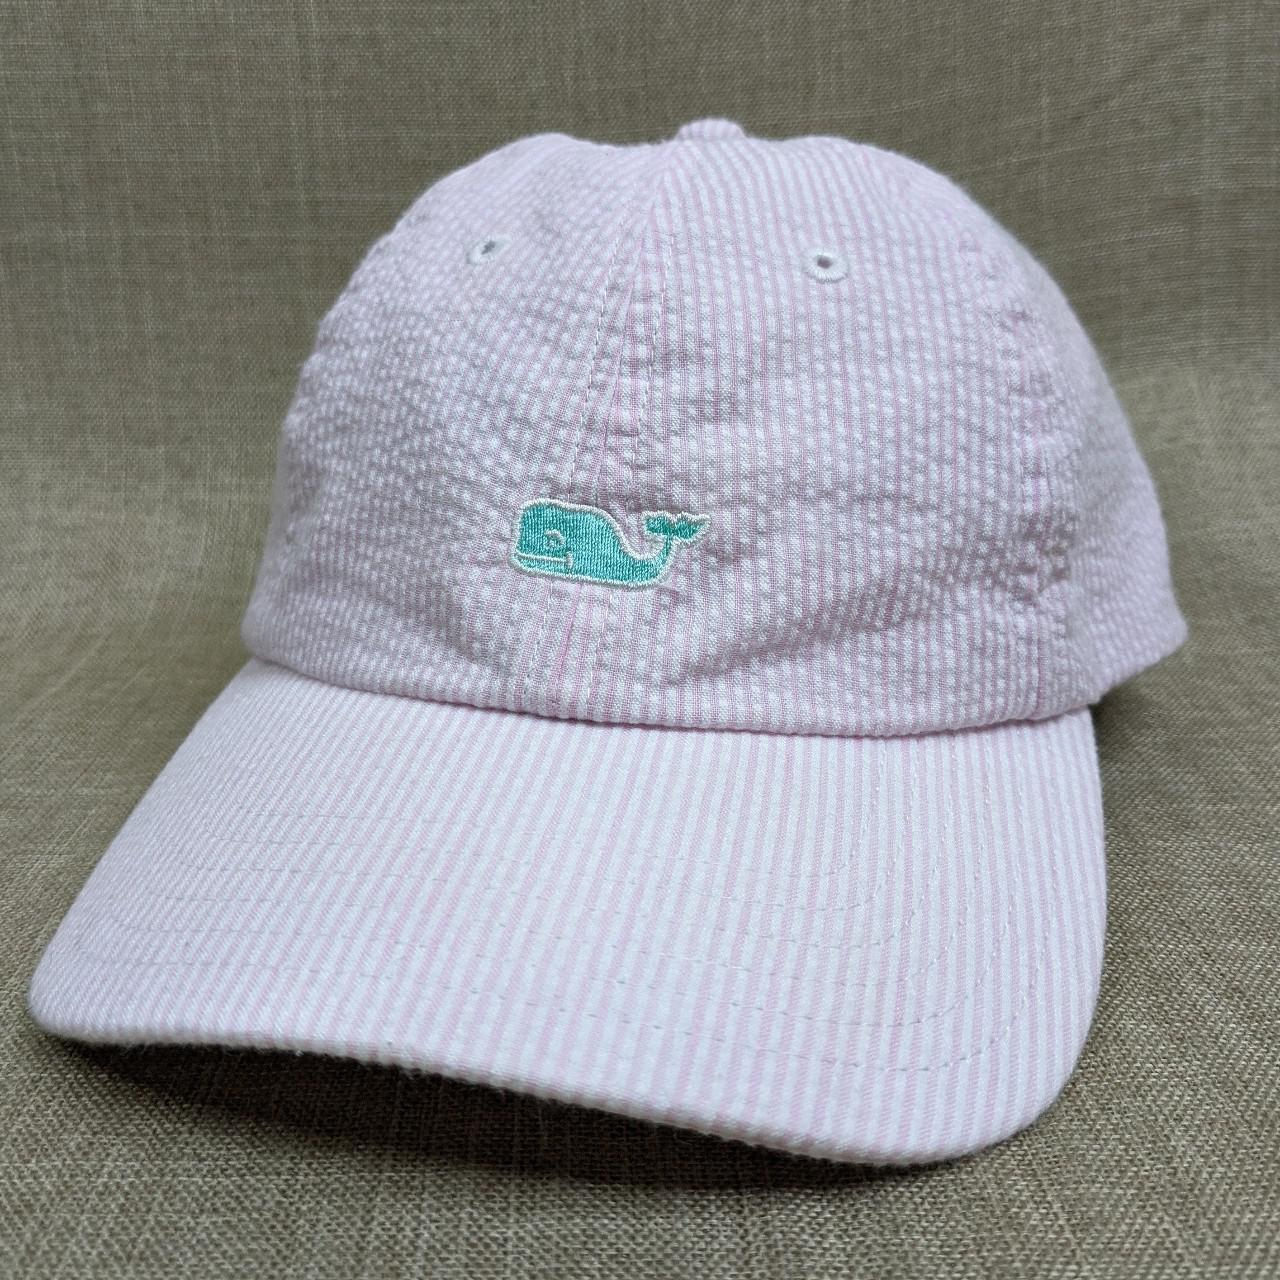 Product Image 1 - Vineyard Vines strapback dad hat